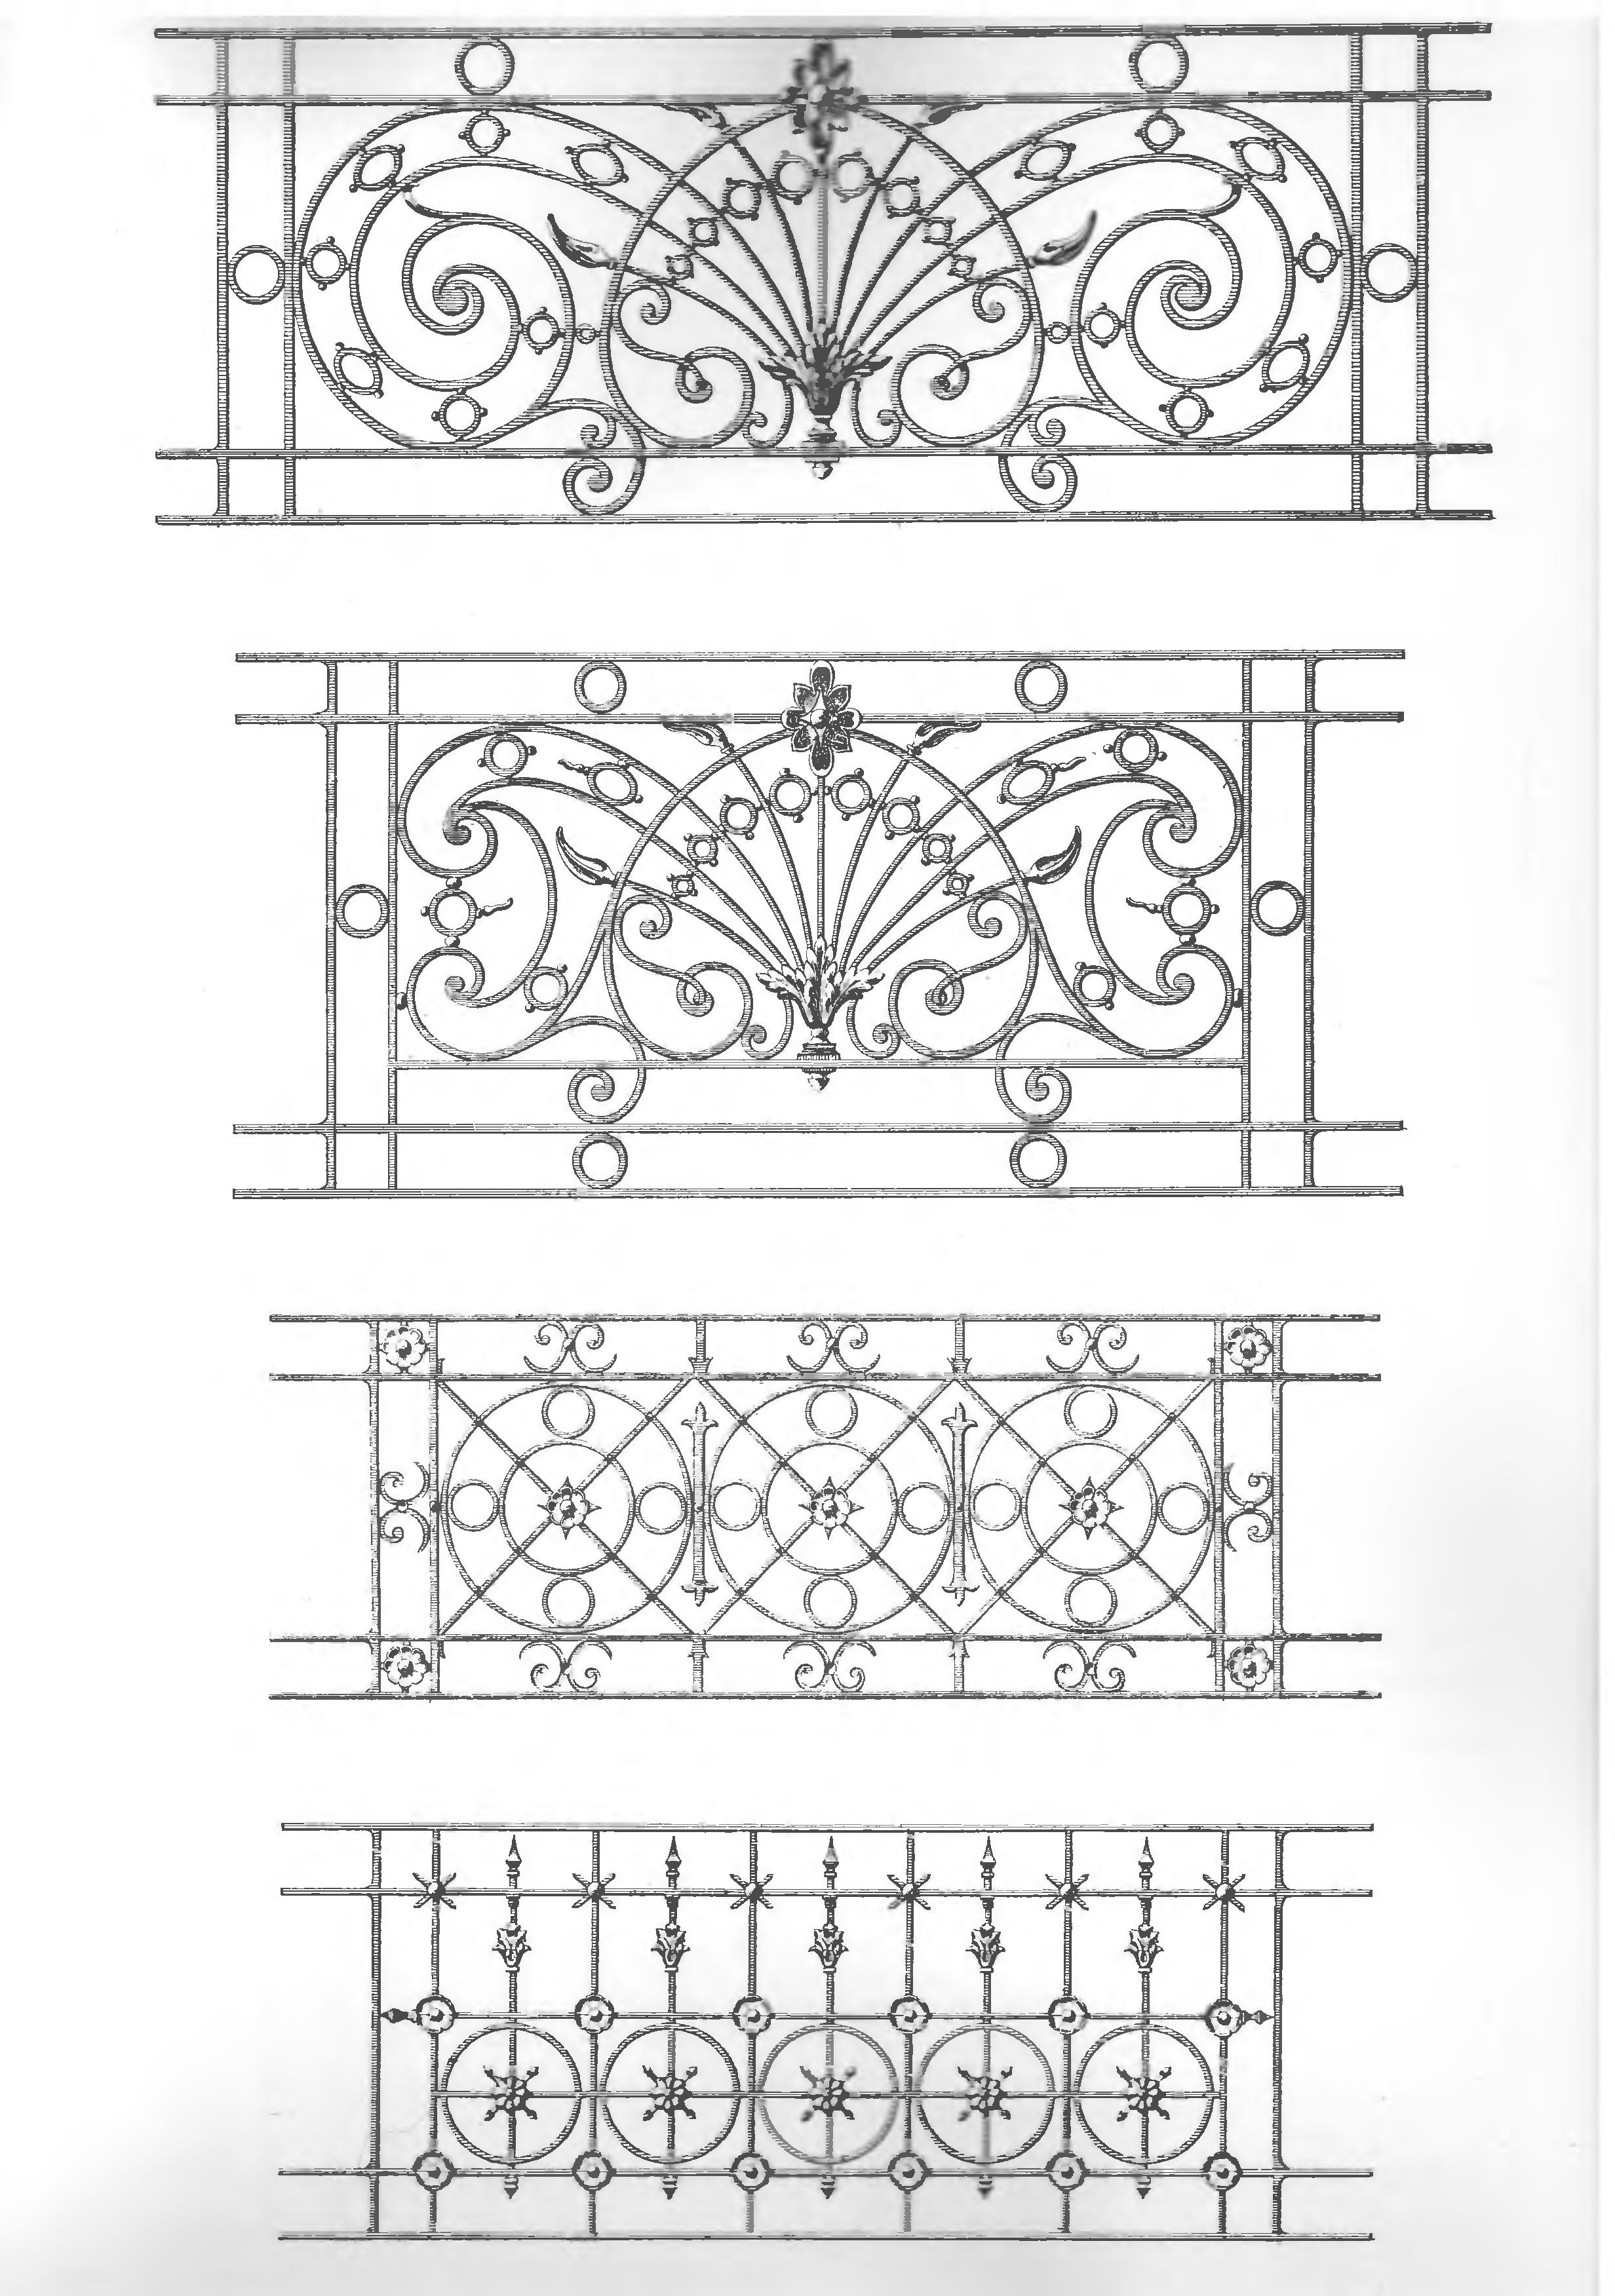 Fenceideasaustralia fence ideas australia pinterest fence